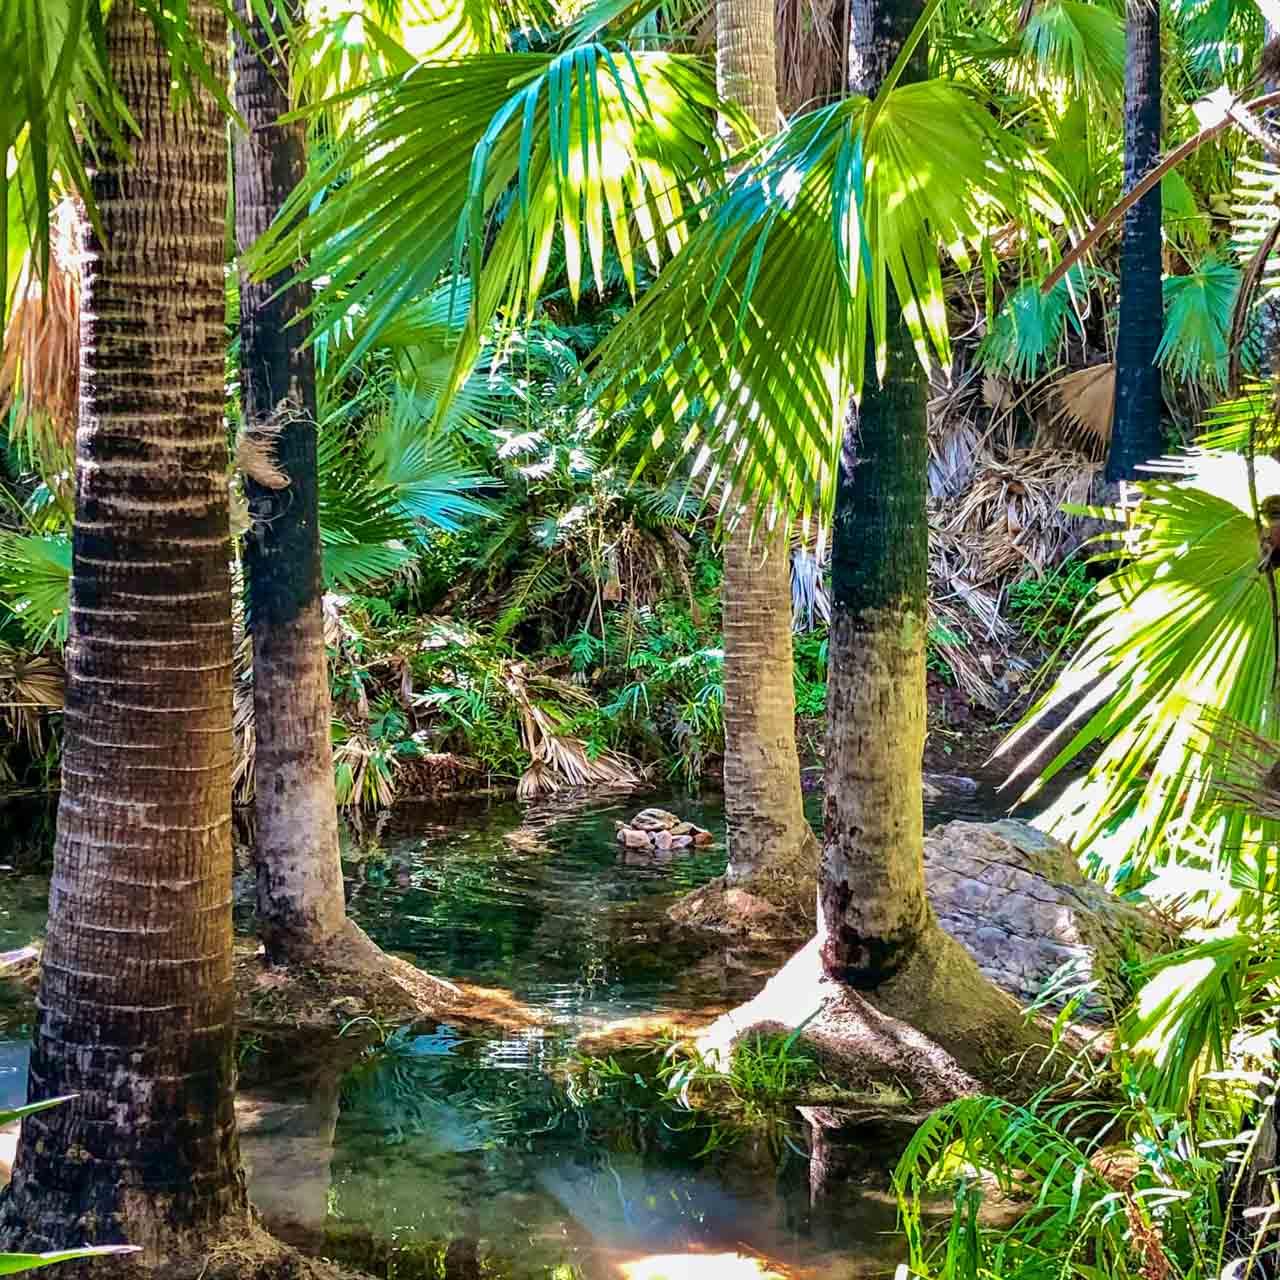 Pools of water between palm trees